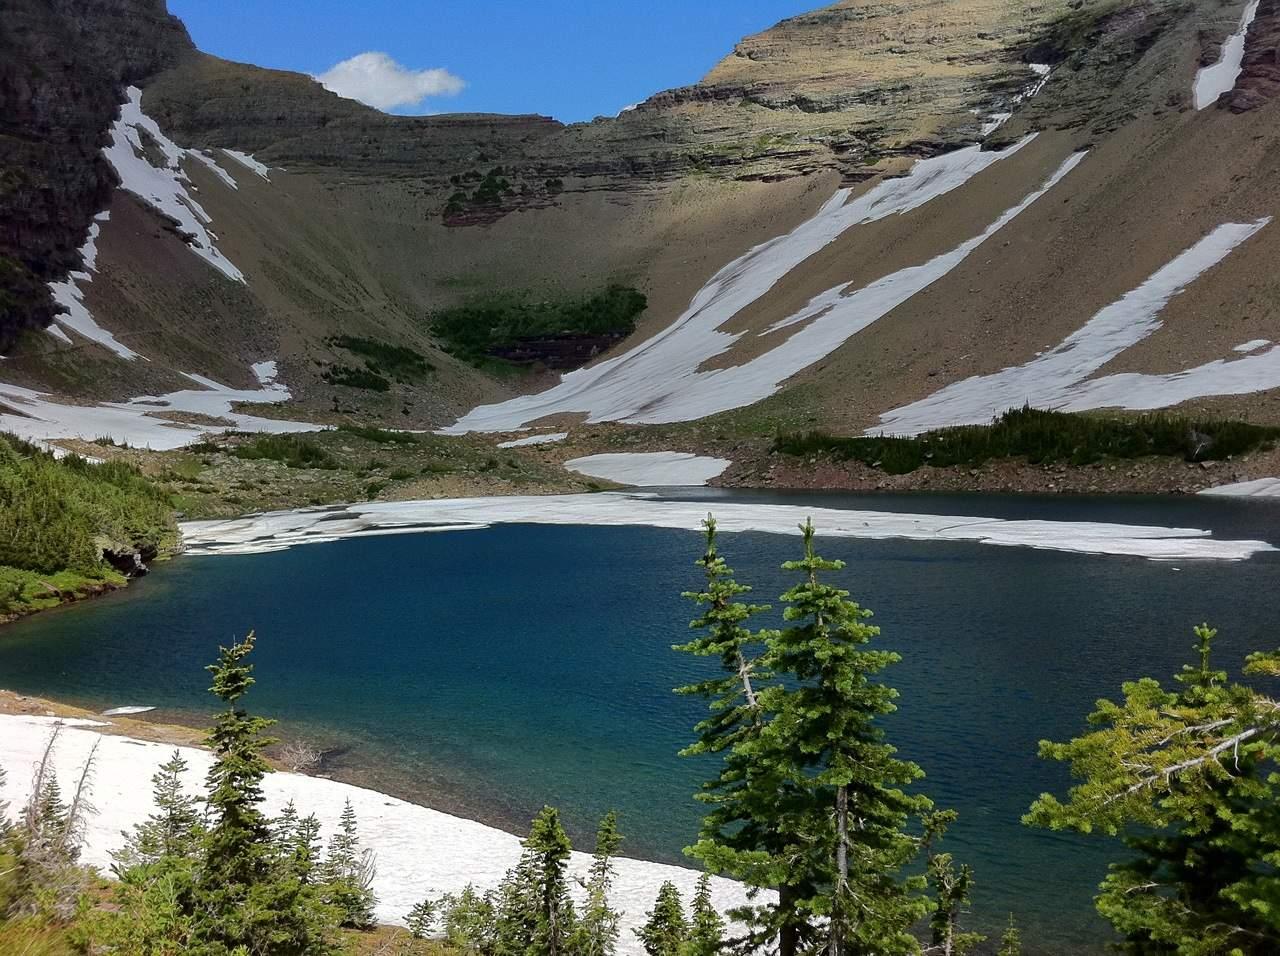 Glacier National Park Hikes - Ptarmigan Tunnel